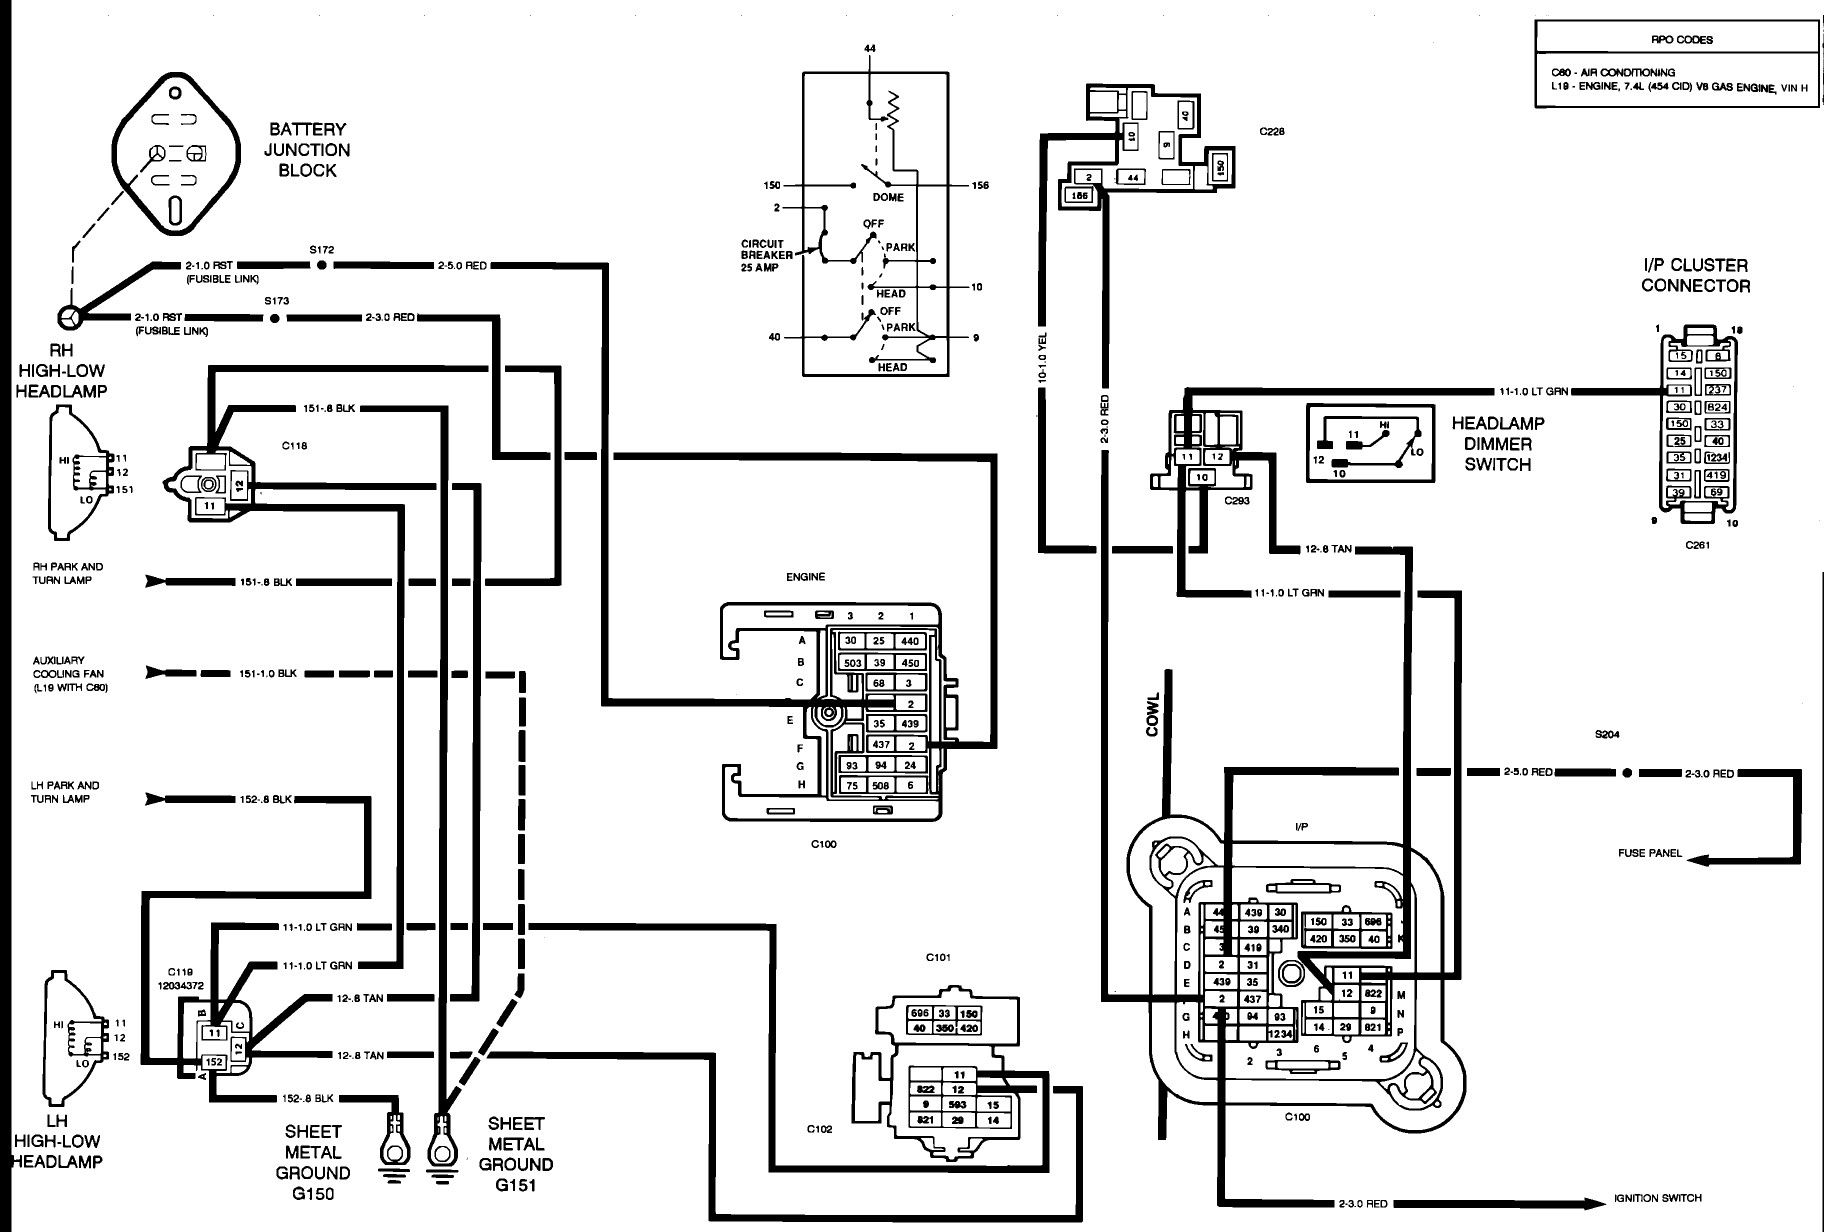 Ultra Remote Car Starter Wiring Diagram in 2021 | Remote car starter,  Diagram, Electrical wiring diagramPinterest